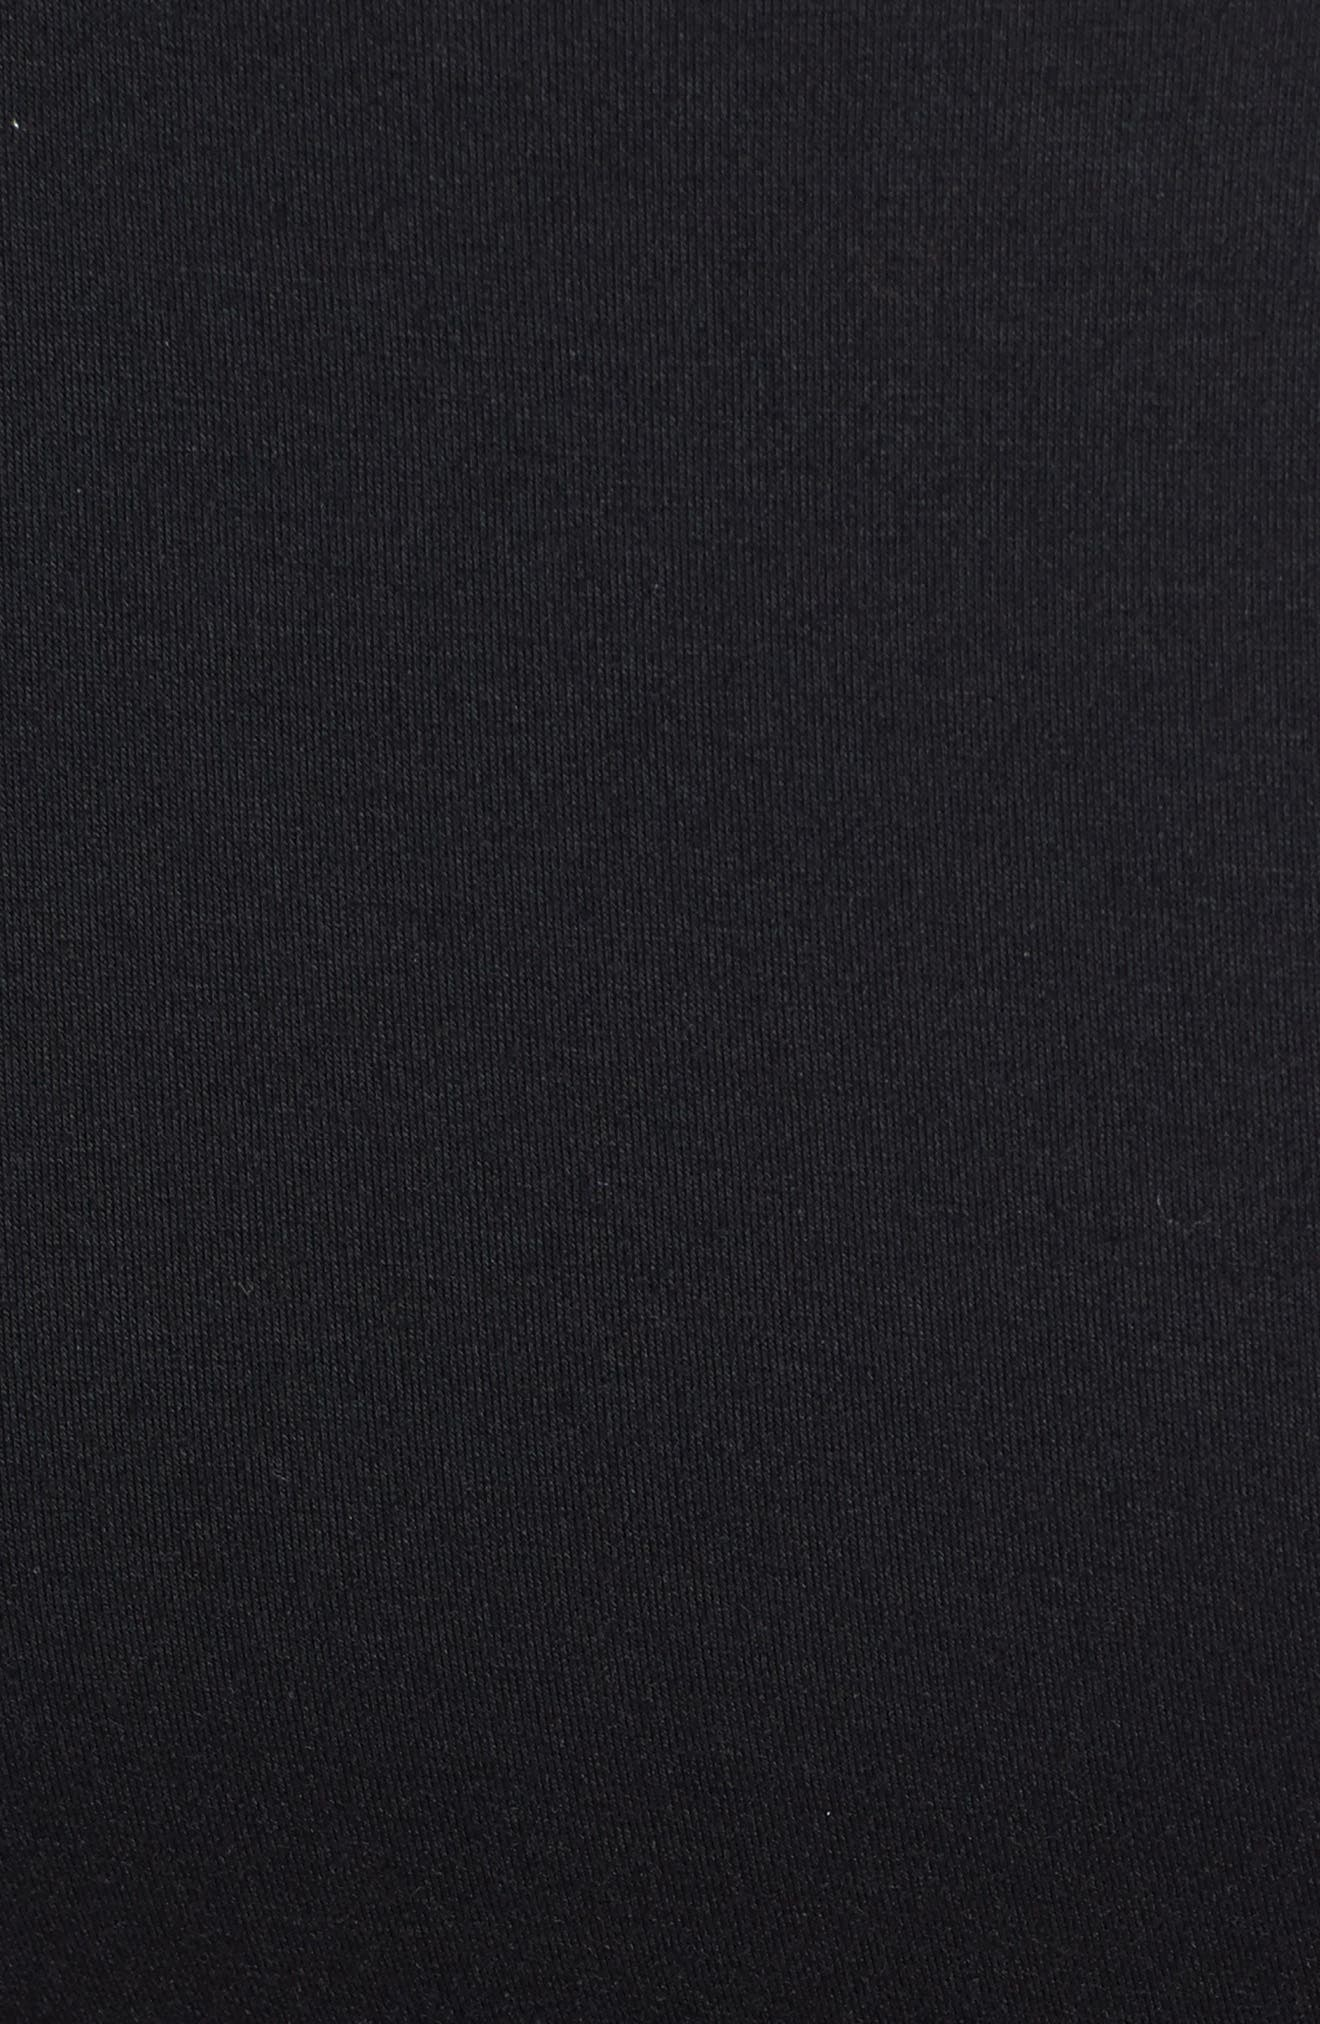 'Hailey' Maternity Dress,                             Alternate thumbnail 3, color,                             BLACK